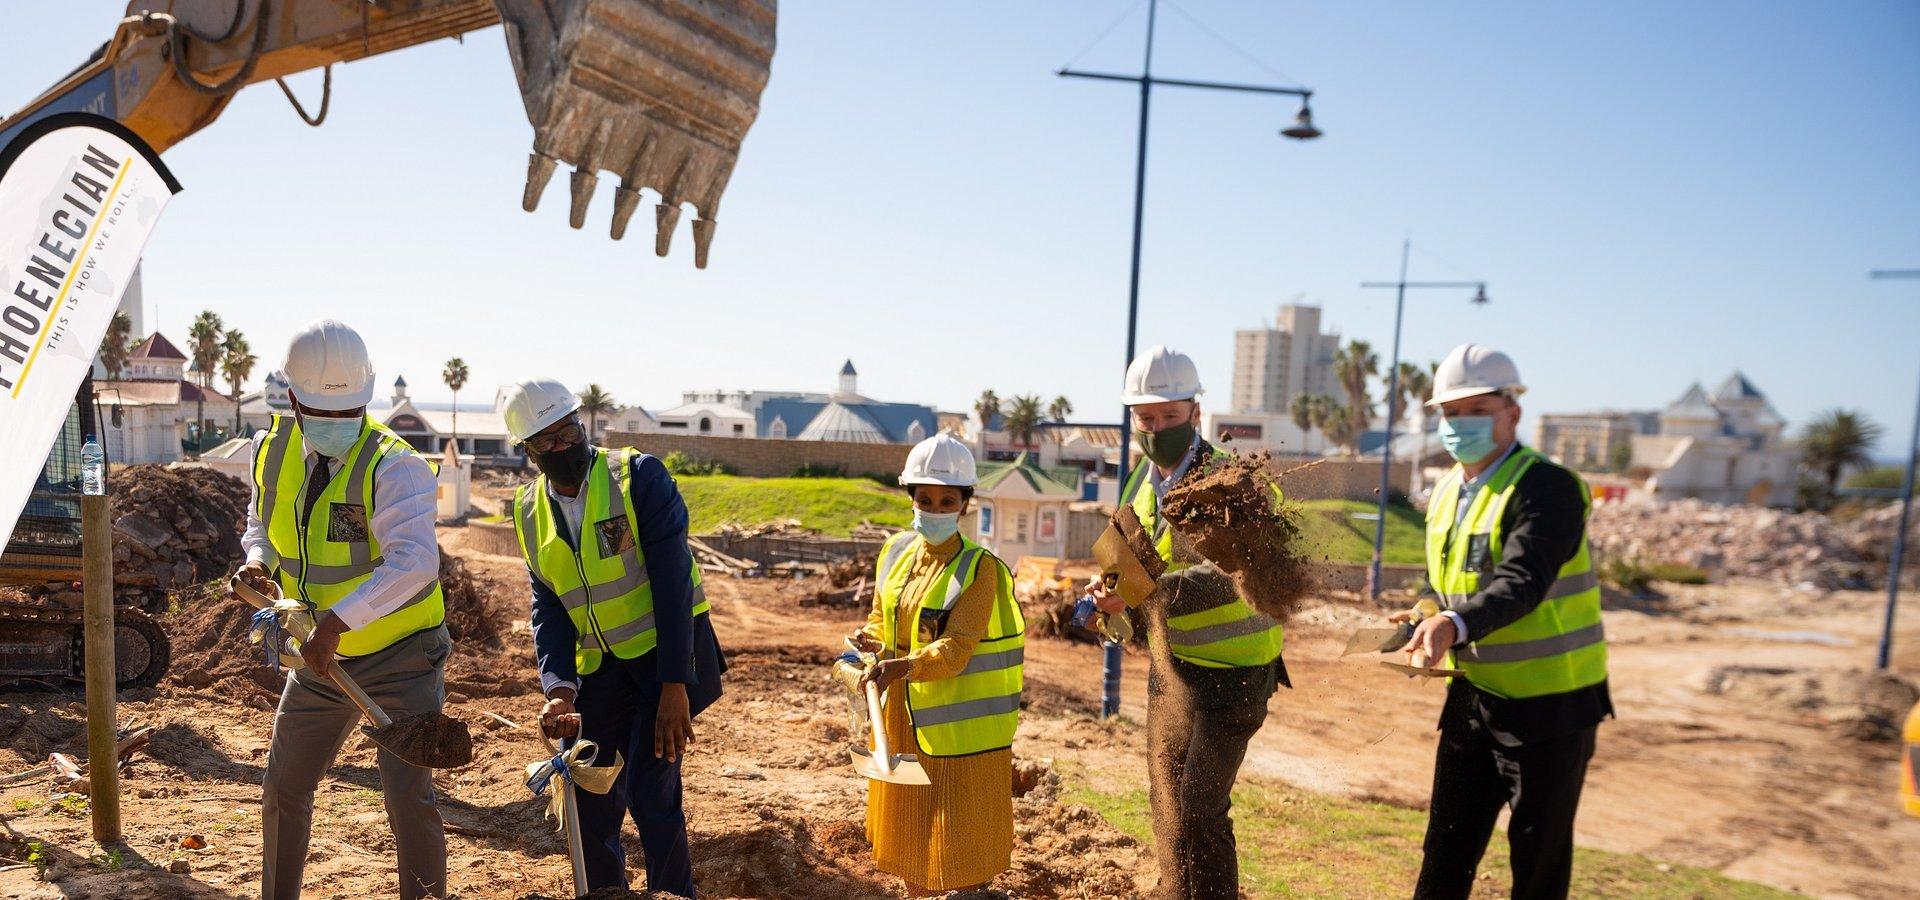 Construction kicks-off at the R500-million Boardwalk Mallunfold_more